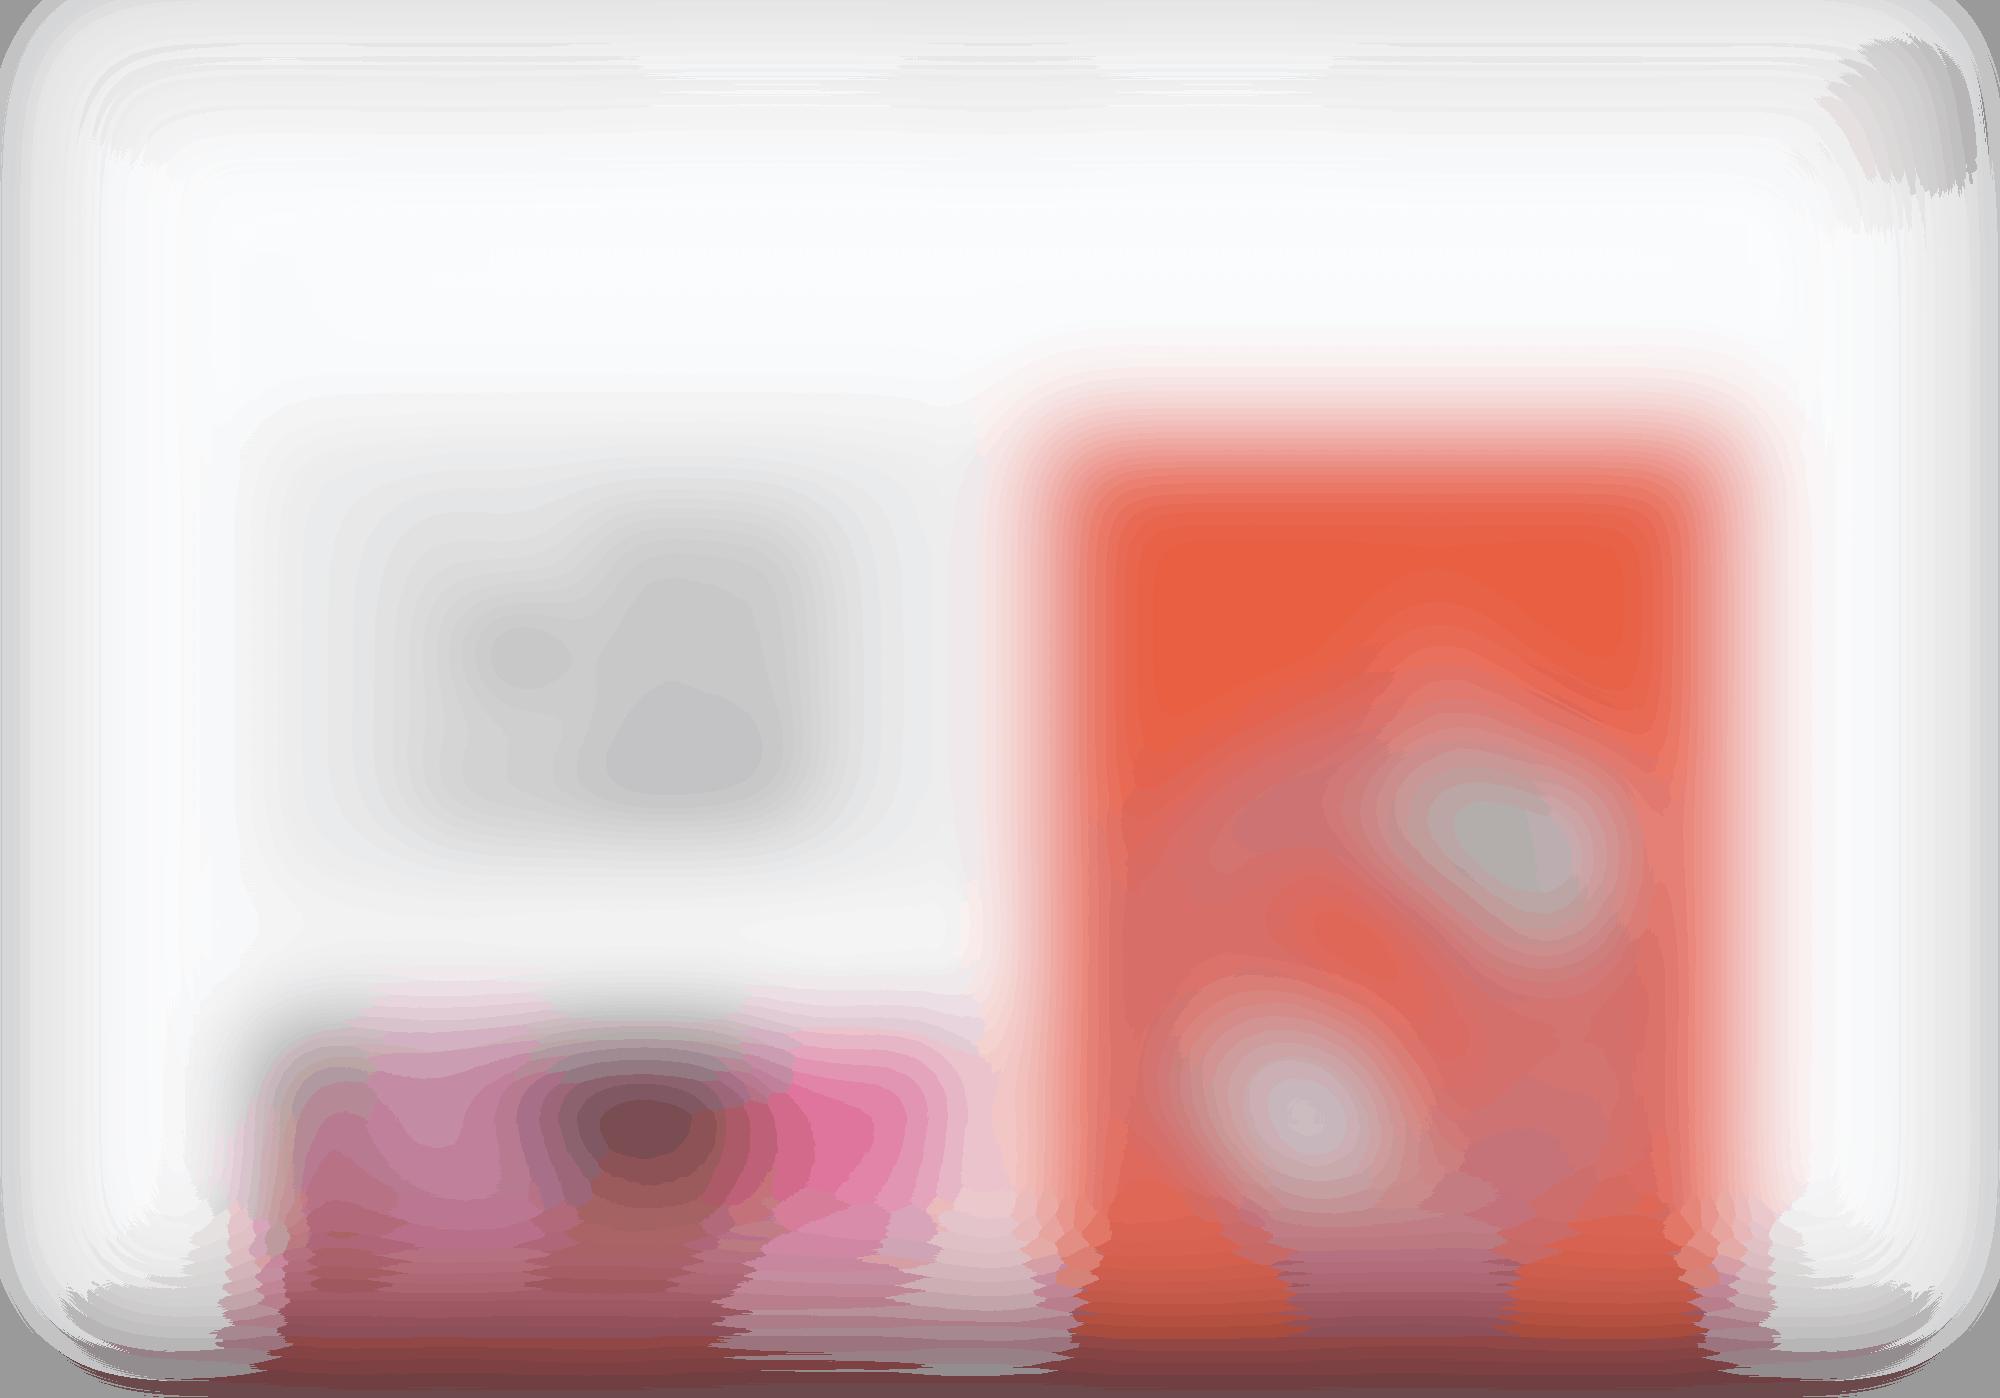 Screen Shot 2018 10 03 at 09 56 13 autocompressfitresizeixlibphp 1 1 0max h2000max w3 D2000q80sadbb27c7ba09005cf8280ce3450c569b